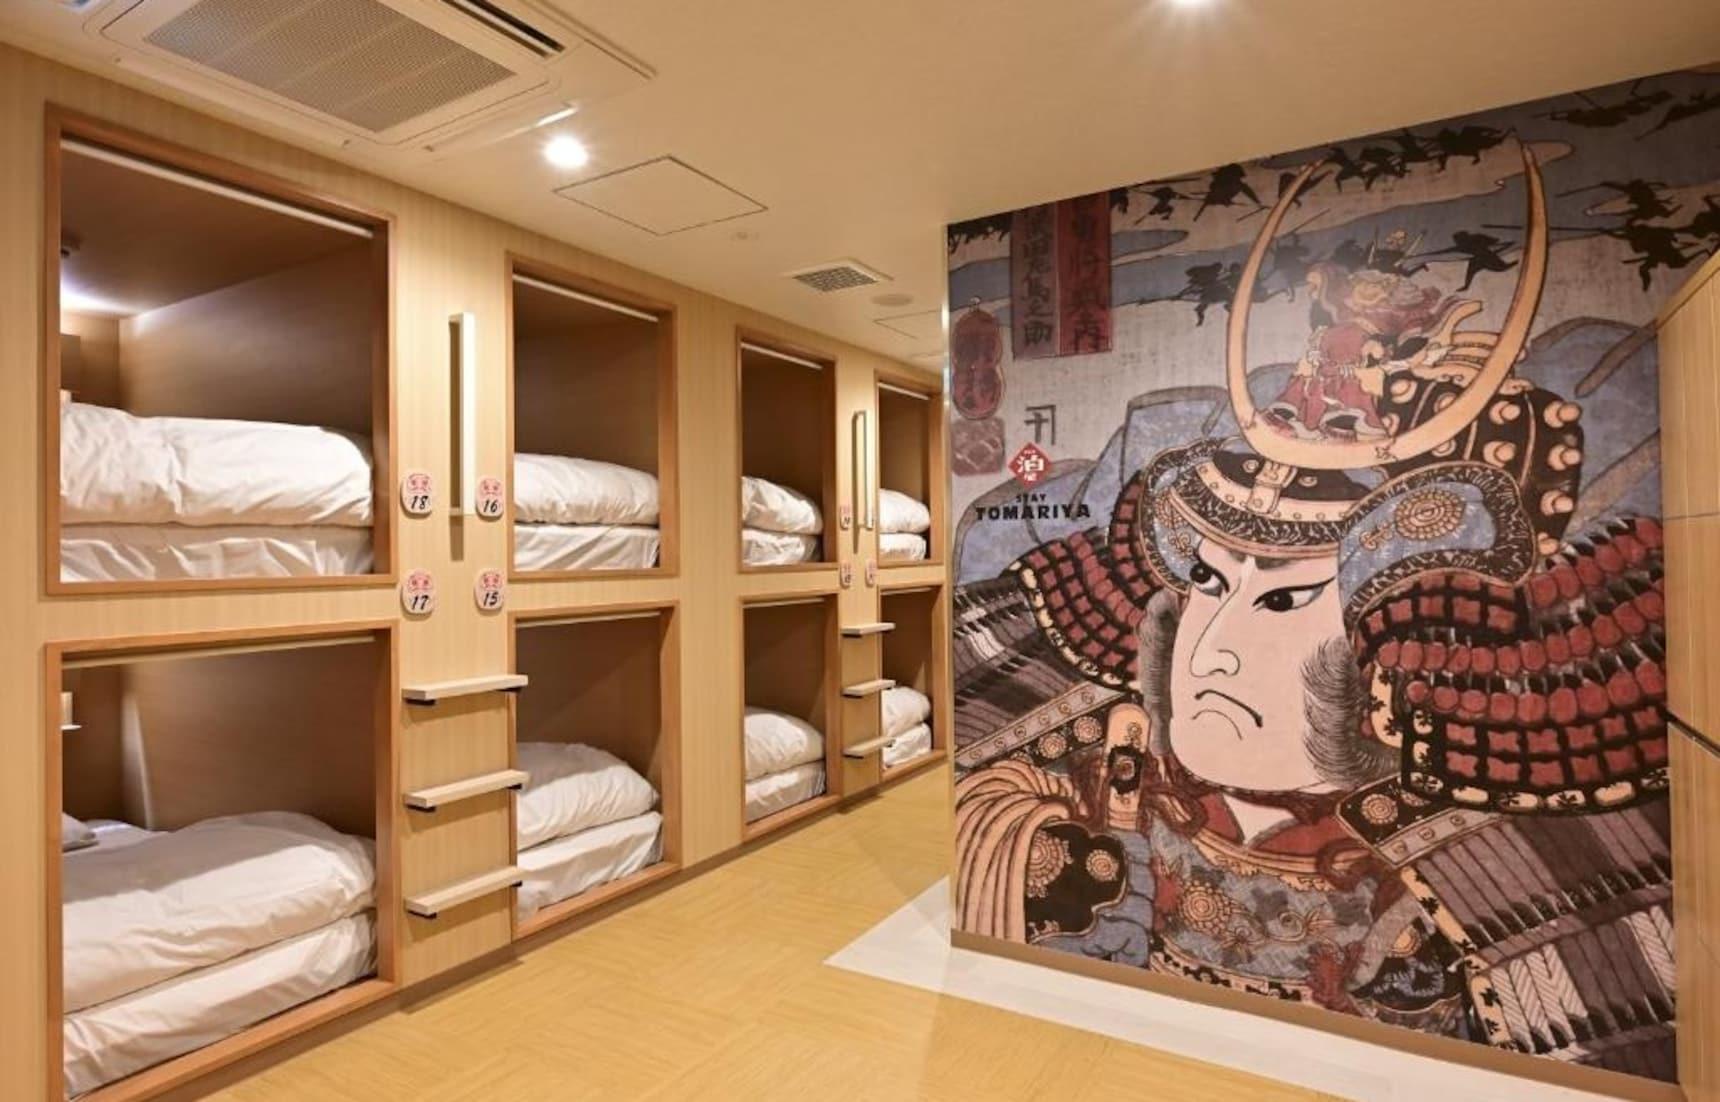 Top 10 Capsule Hotels Near Ginza, Japan